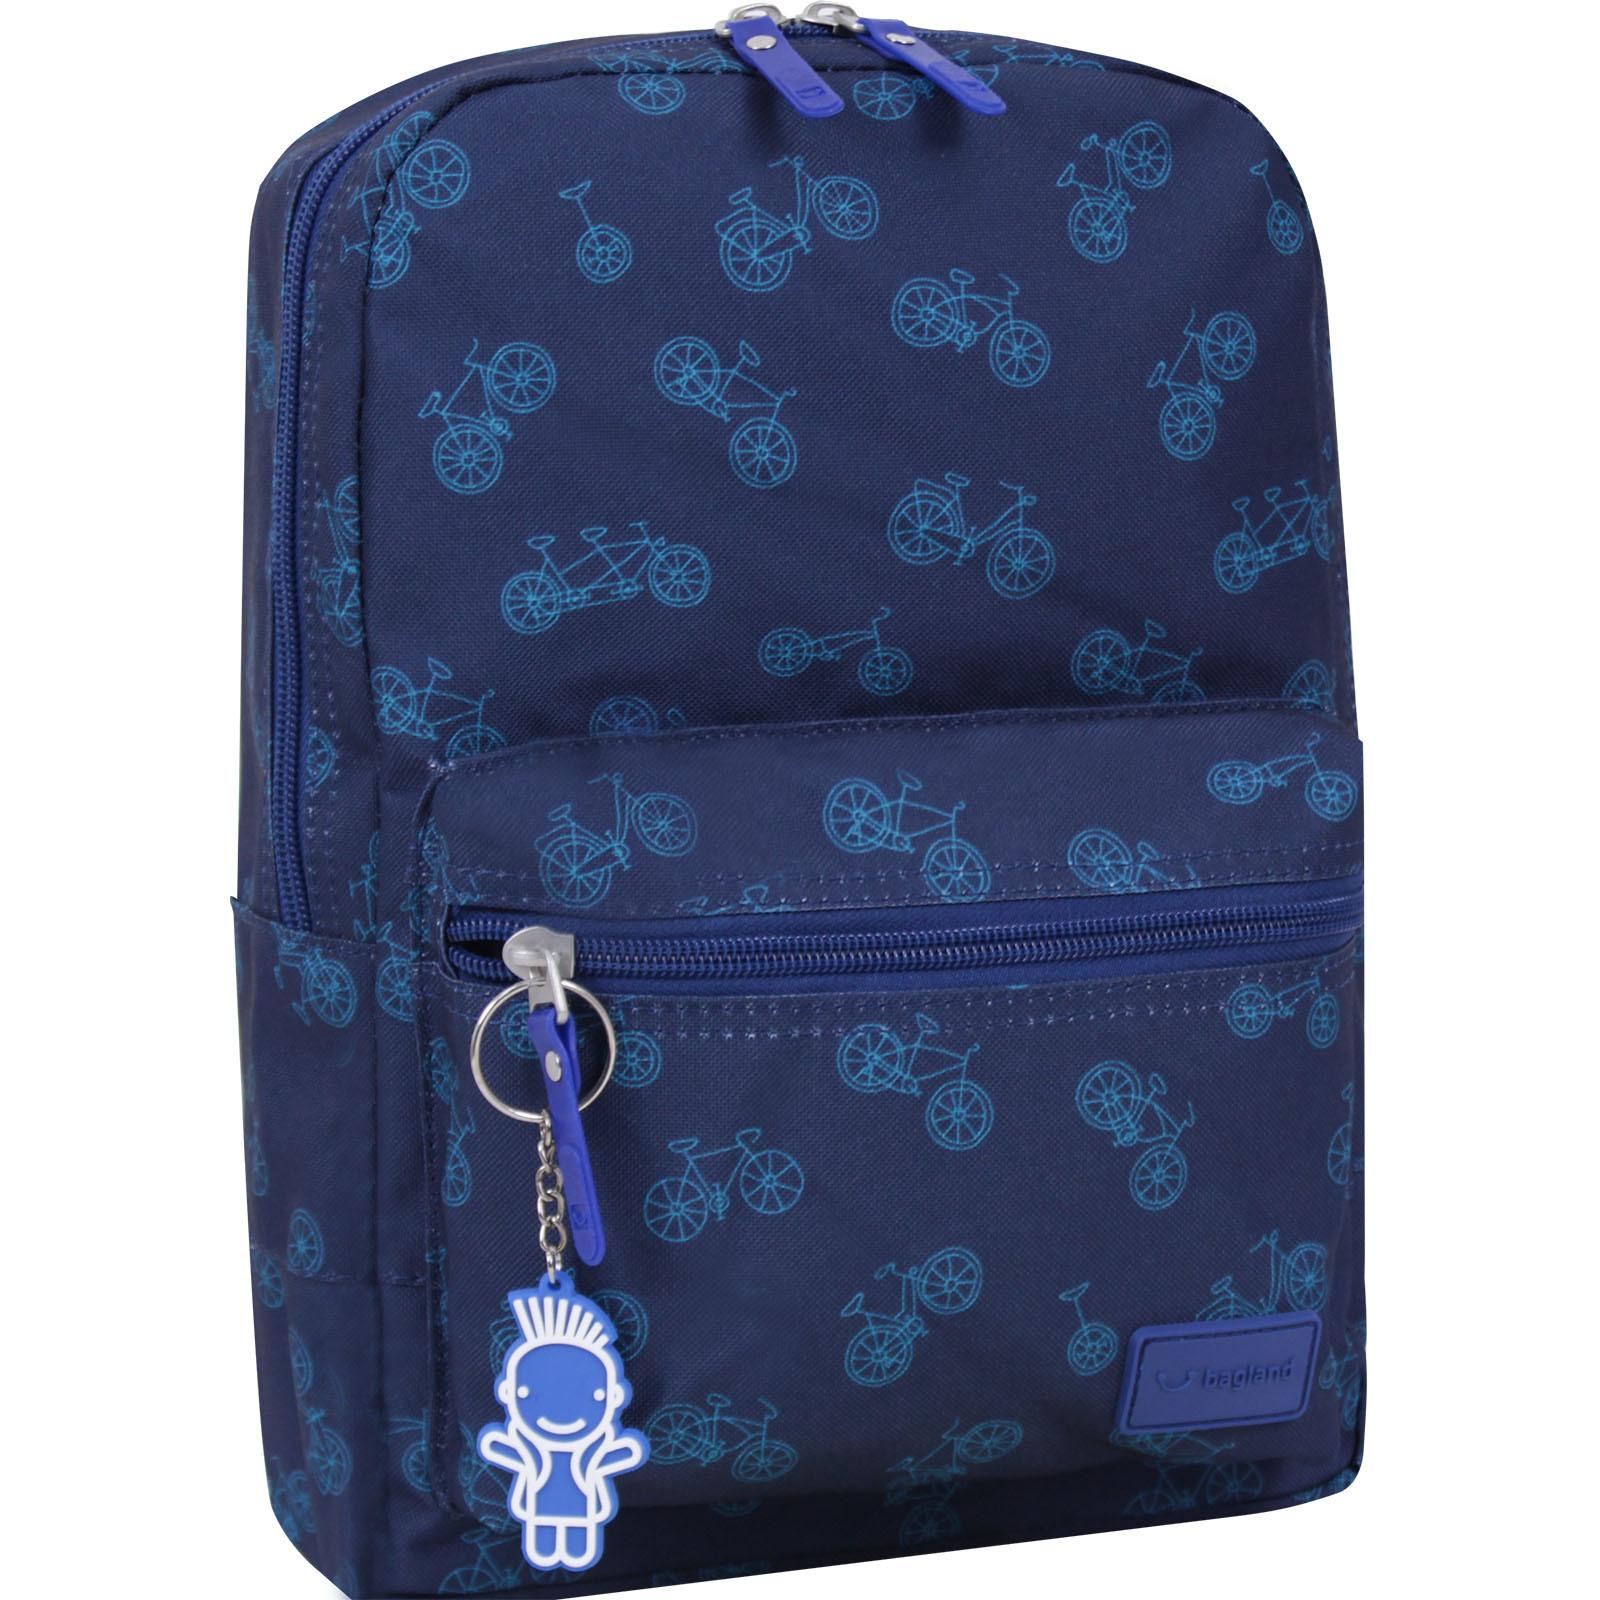 Детские рюкзаки Рюкзак Bagland Молодежный mini 8 л. сублімація 340 (00508664) IMG_8234суб340-1600.jpg